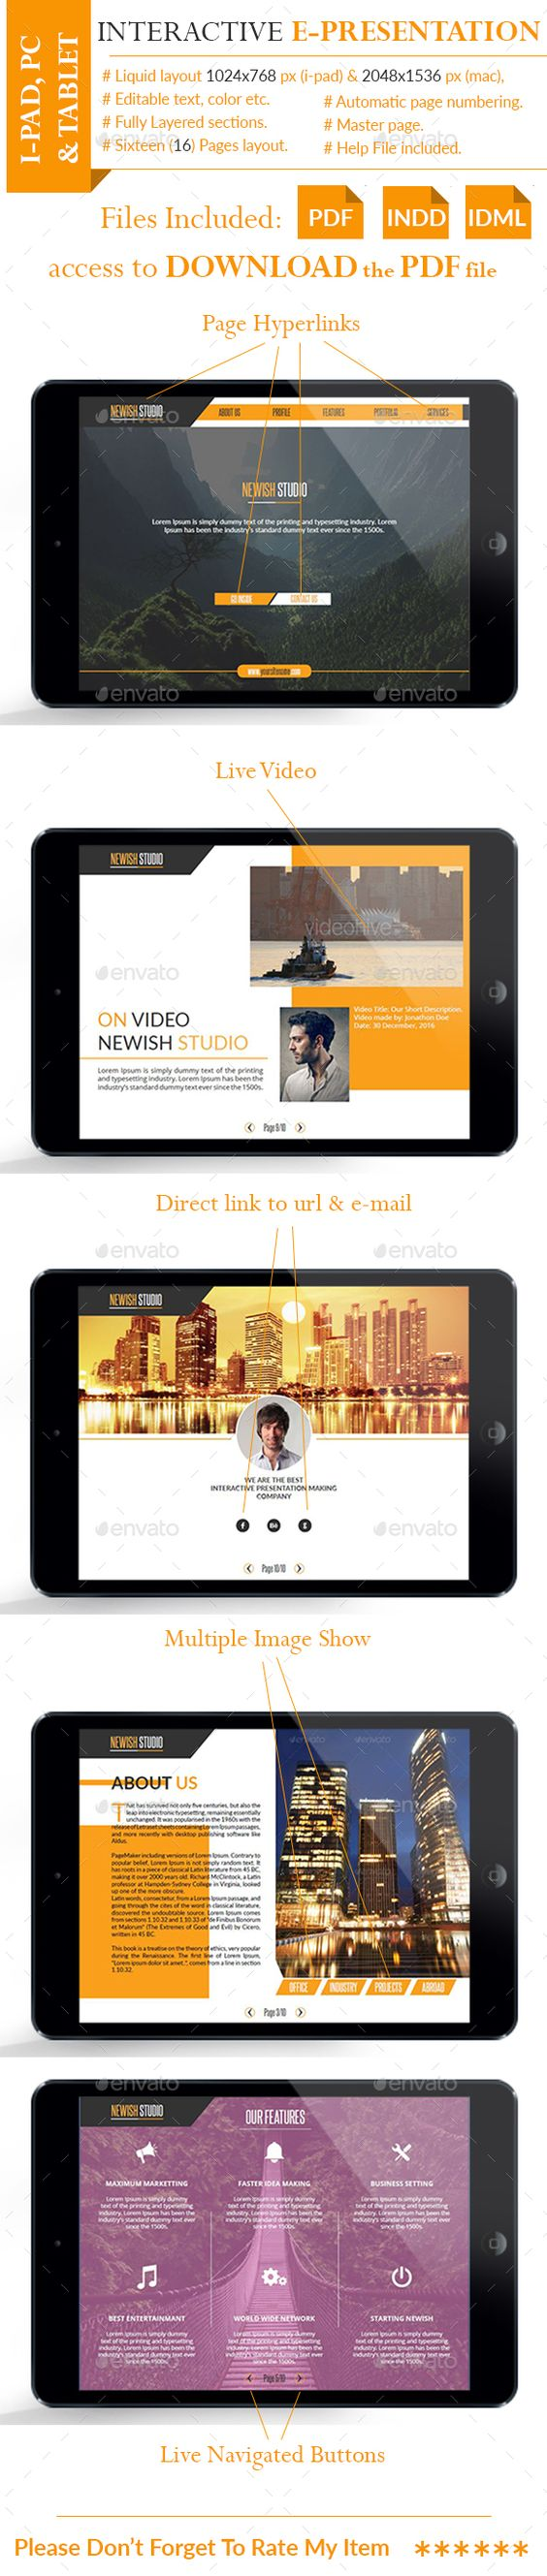 Interactive PDF Presentation | Templates, Presentation templates ...